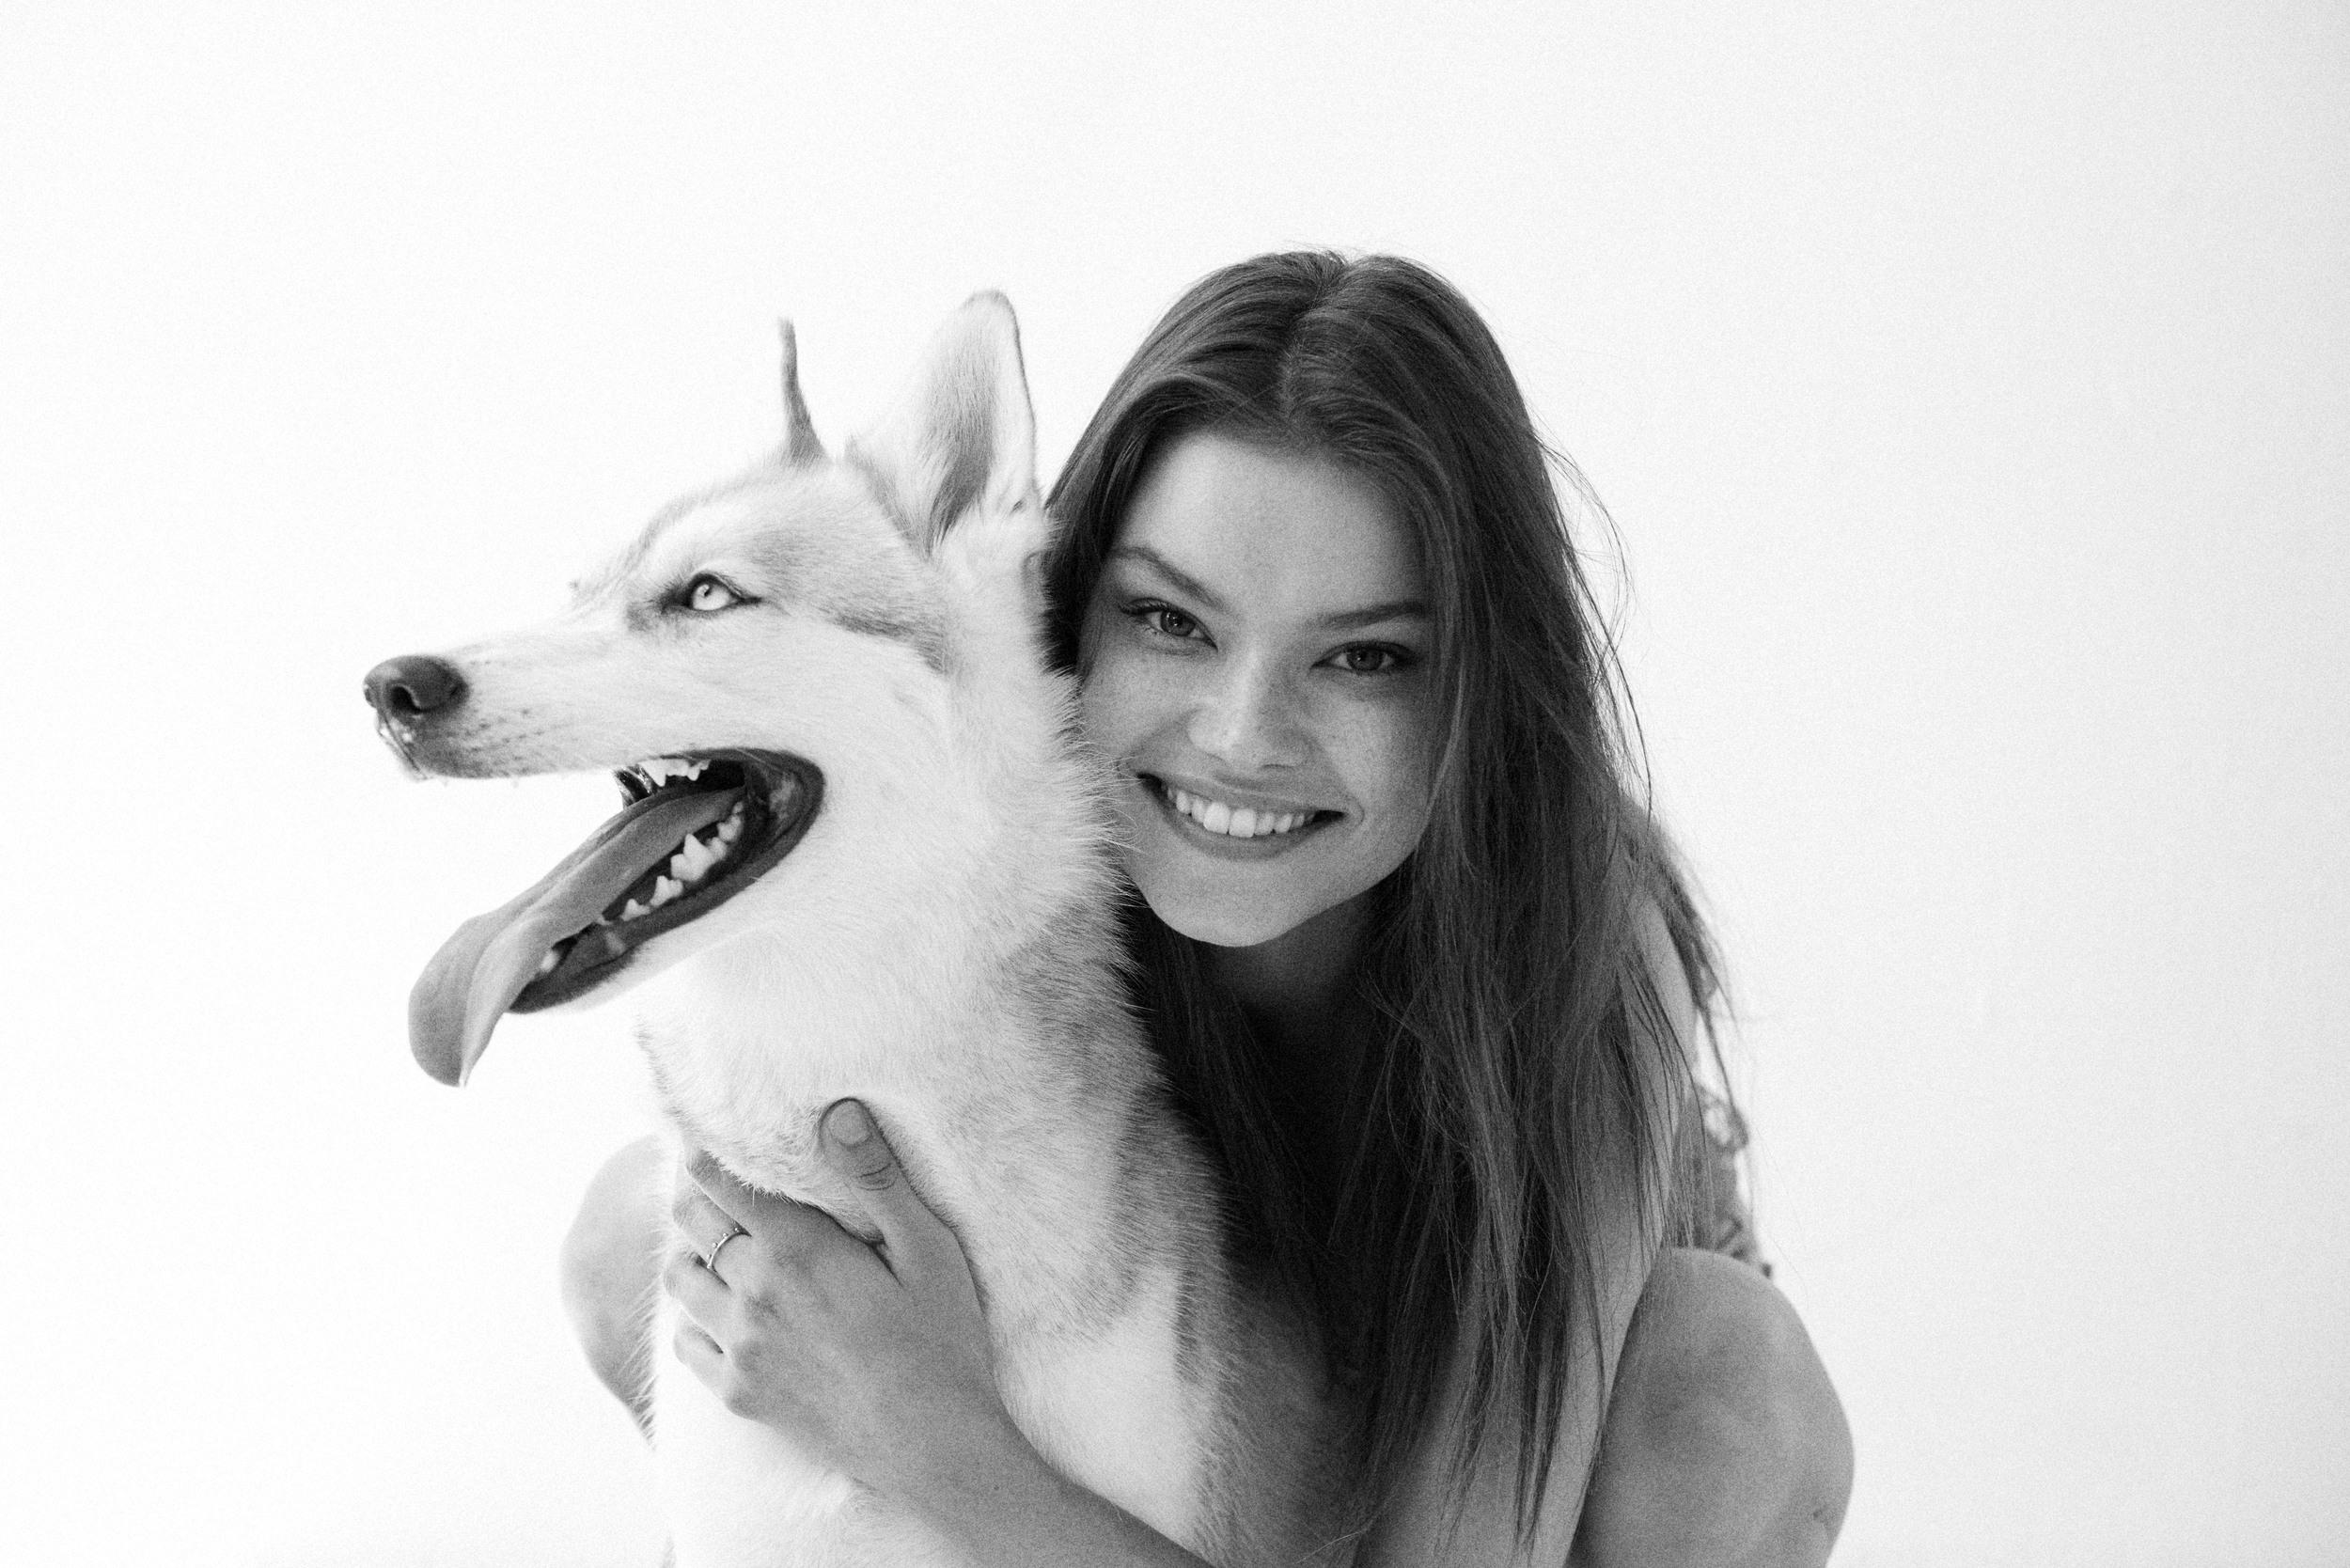 Alexandra Vittekova at One.1 Management with her dog Kaya